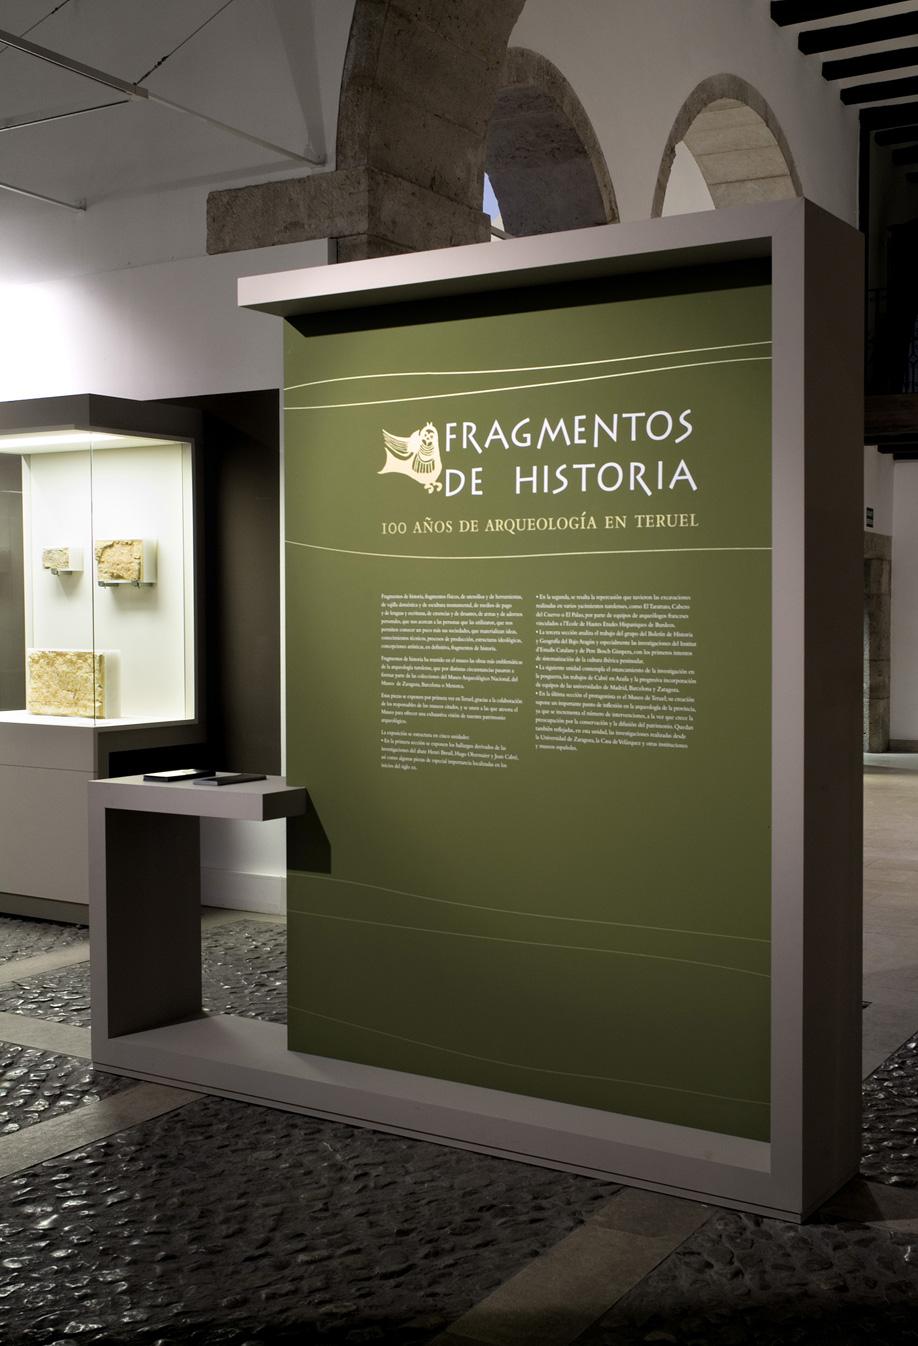 Cien_anos_de_arqueologia_en_teruel_1.jpg